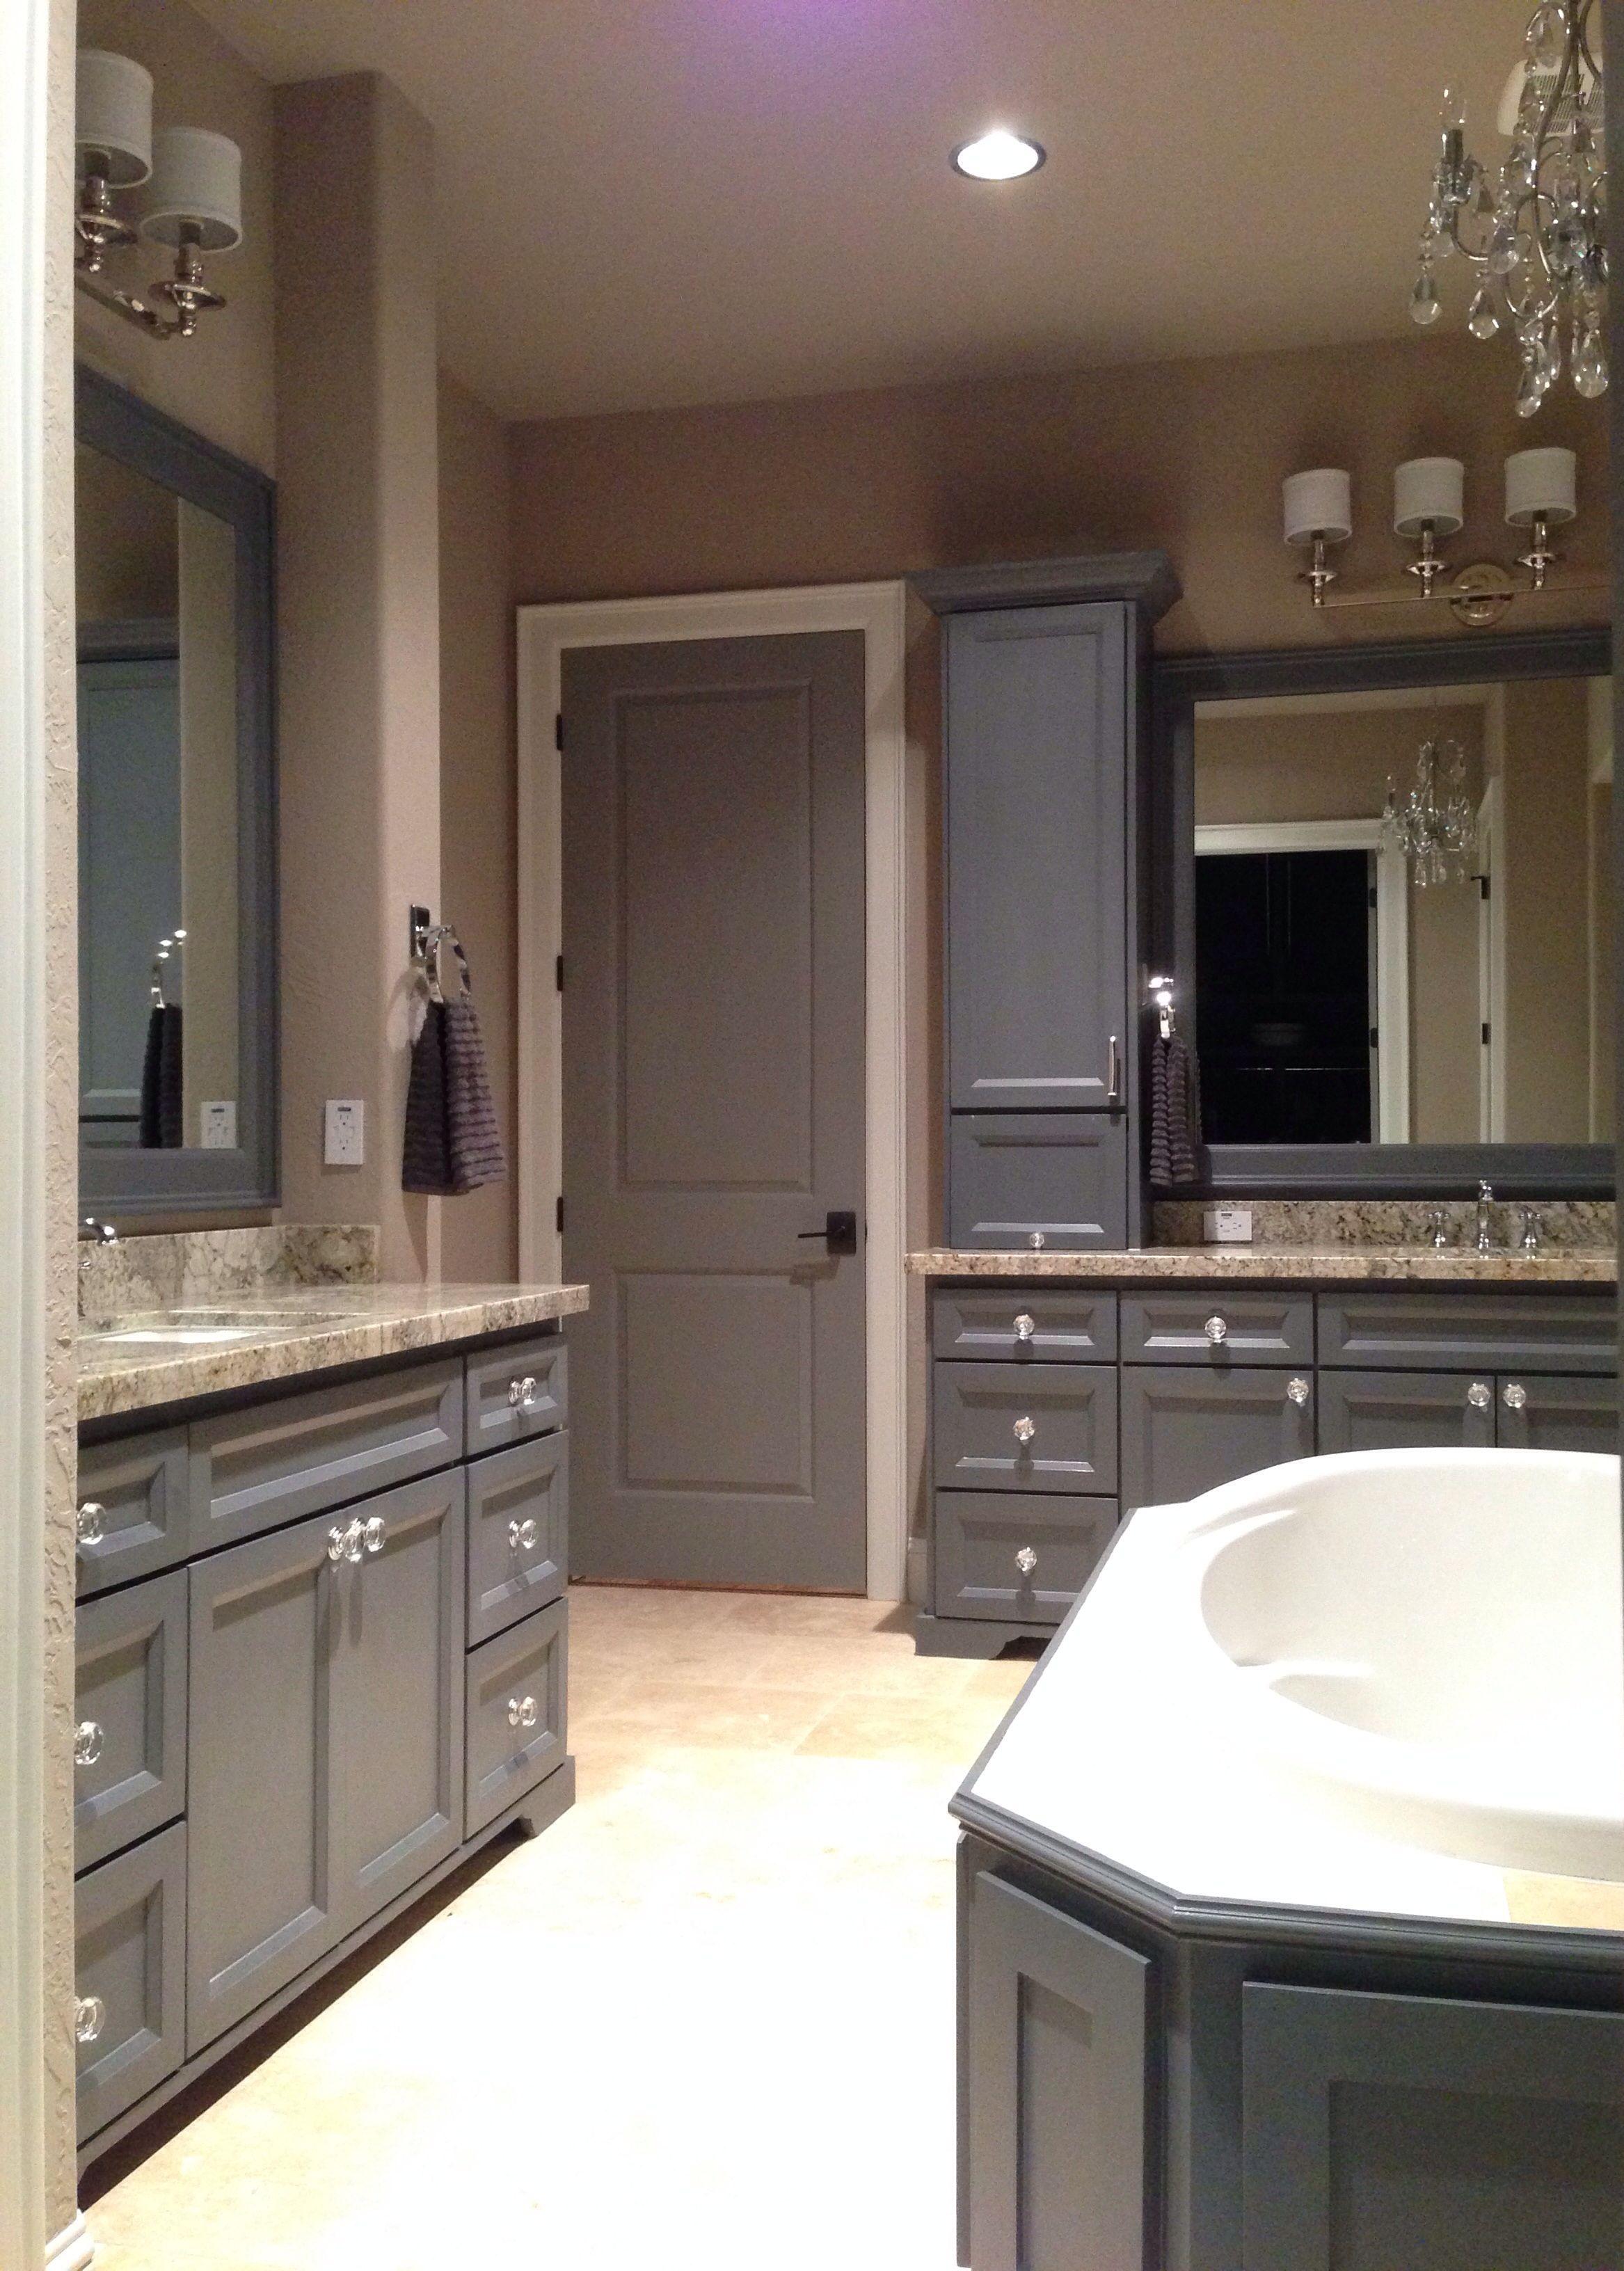 Pin By Kosal Tredway On Mi Casa White Bathroom Cabinets Grey